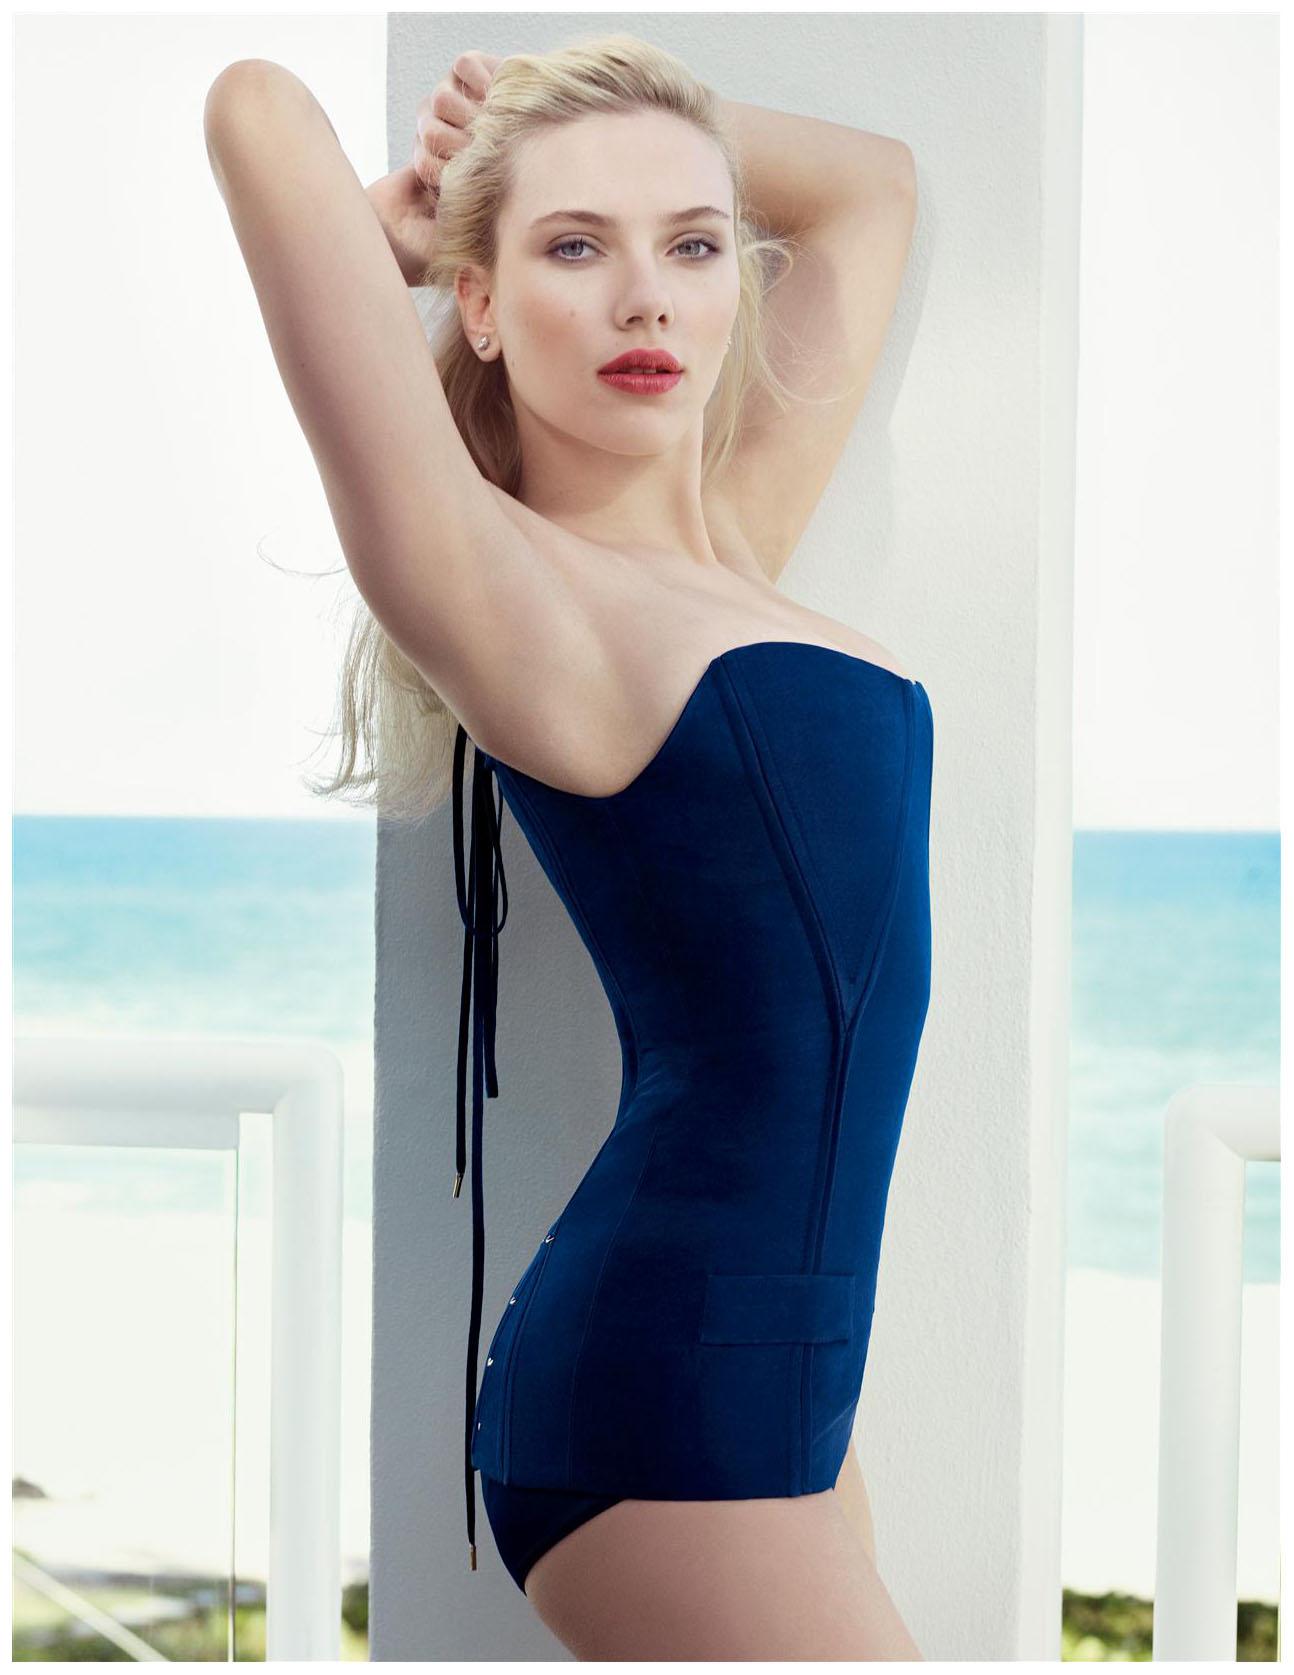 Scarlett Johansson | © Pleasurephoto Скарлет Мк